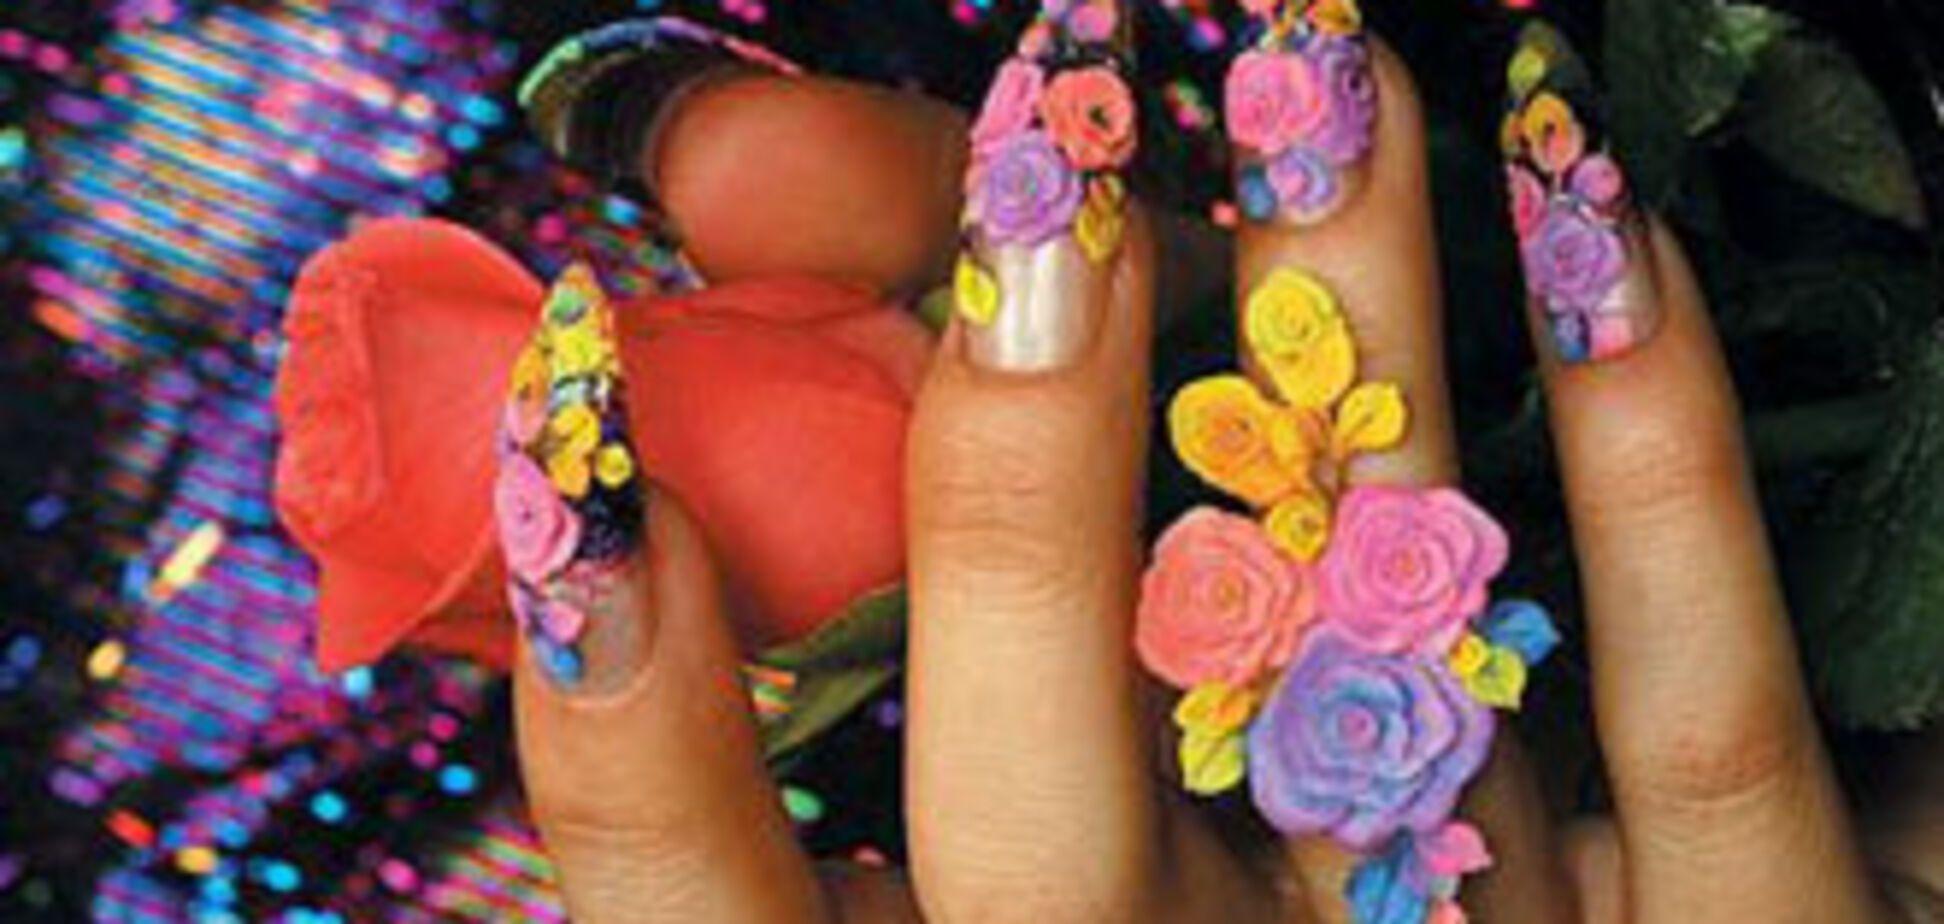 Нейл арт: твір мистецтва на ваших руках